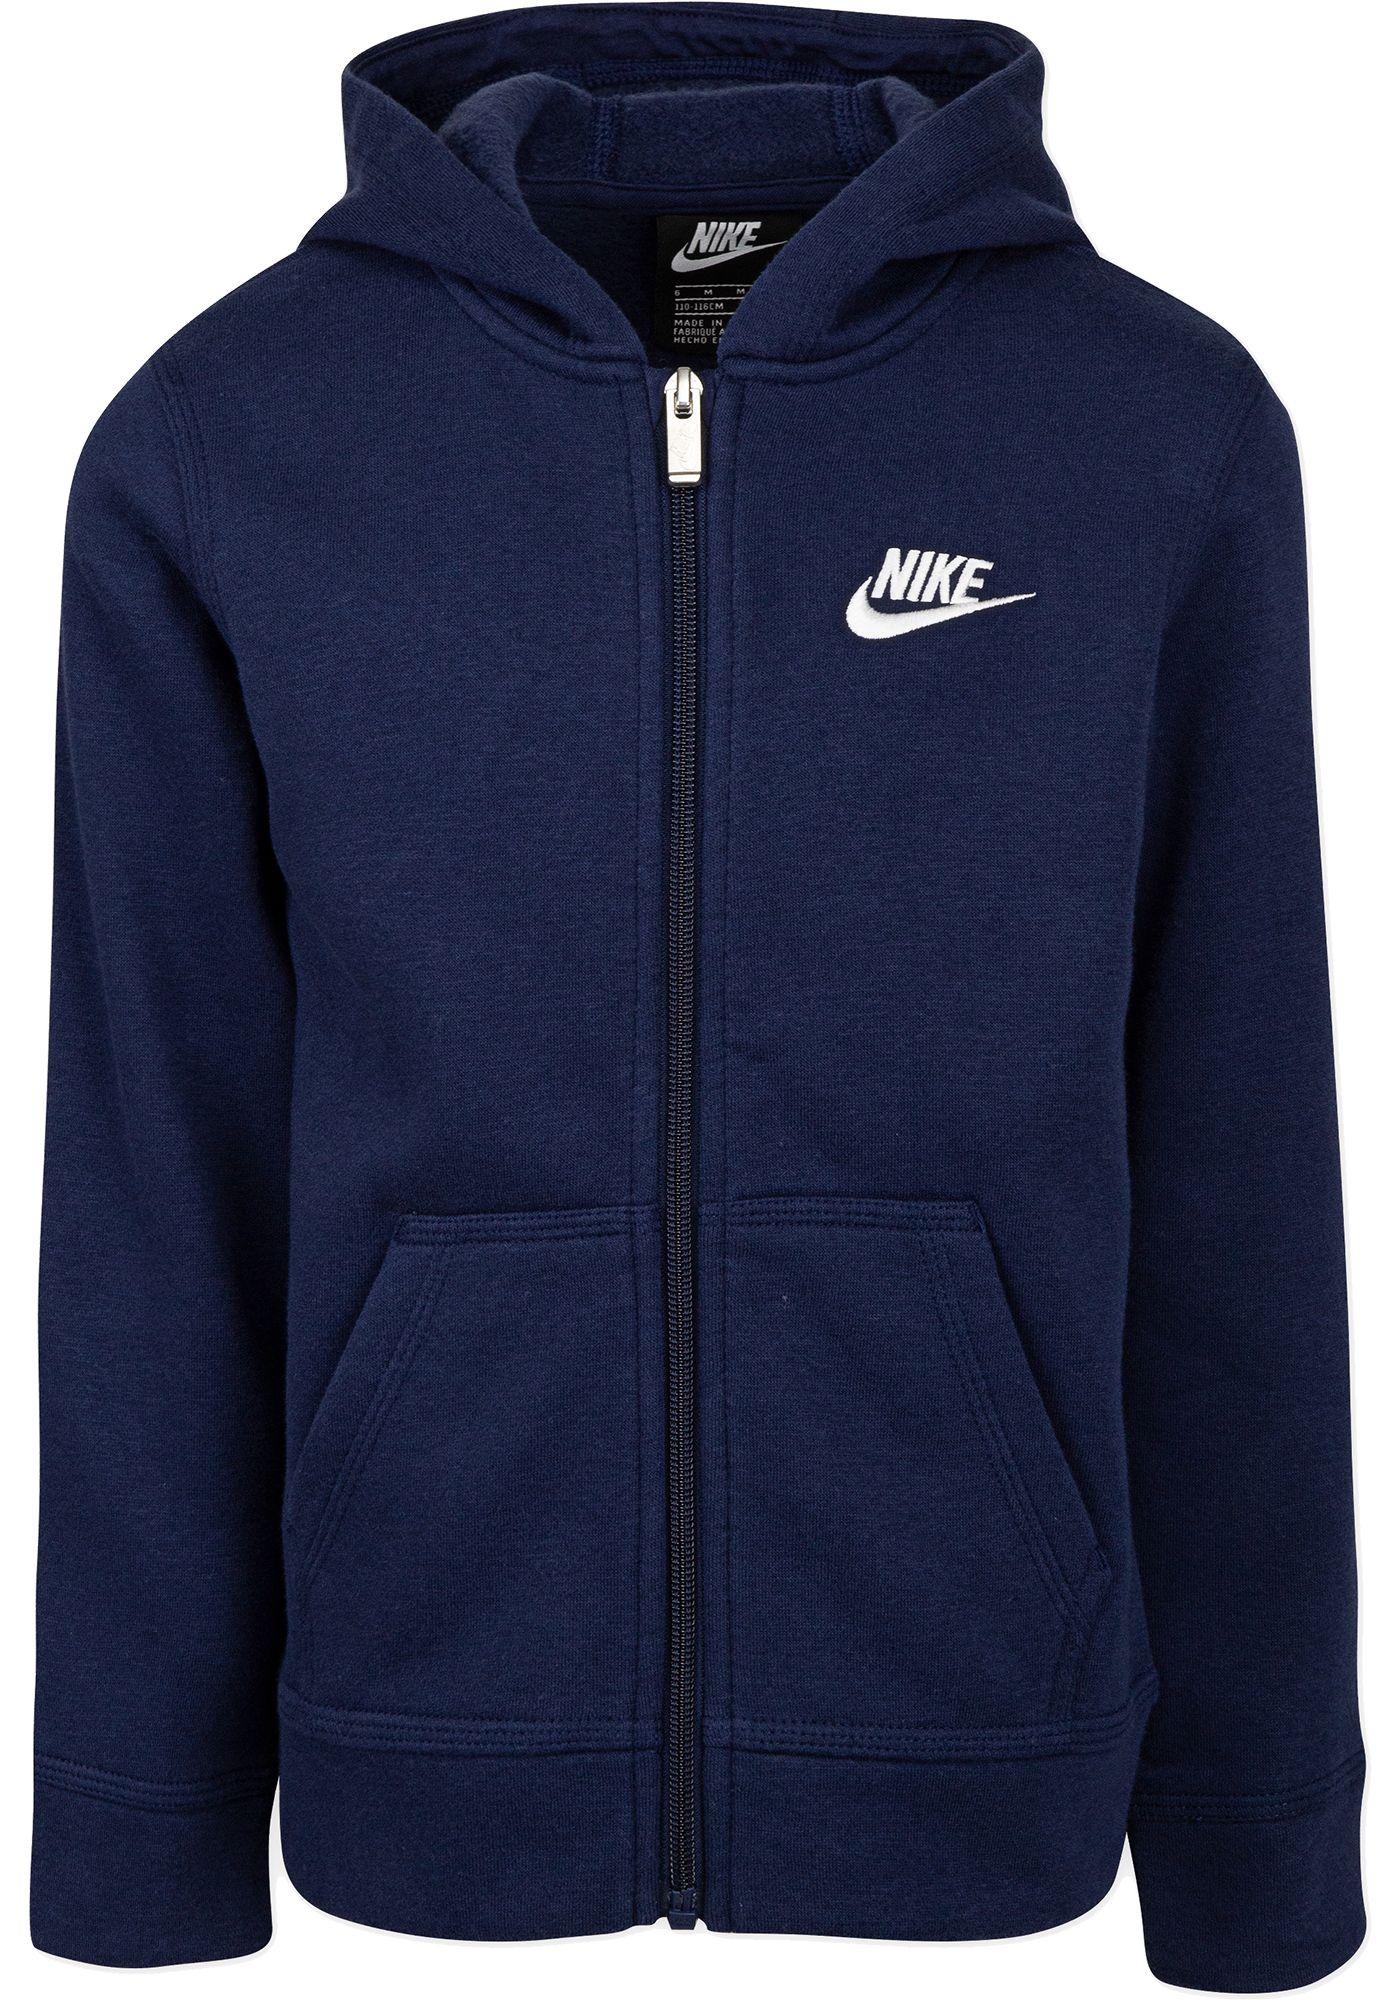 Nike Little Boys' Fleece Full Zip Hoodie